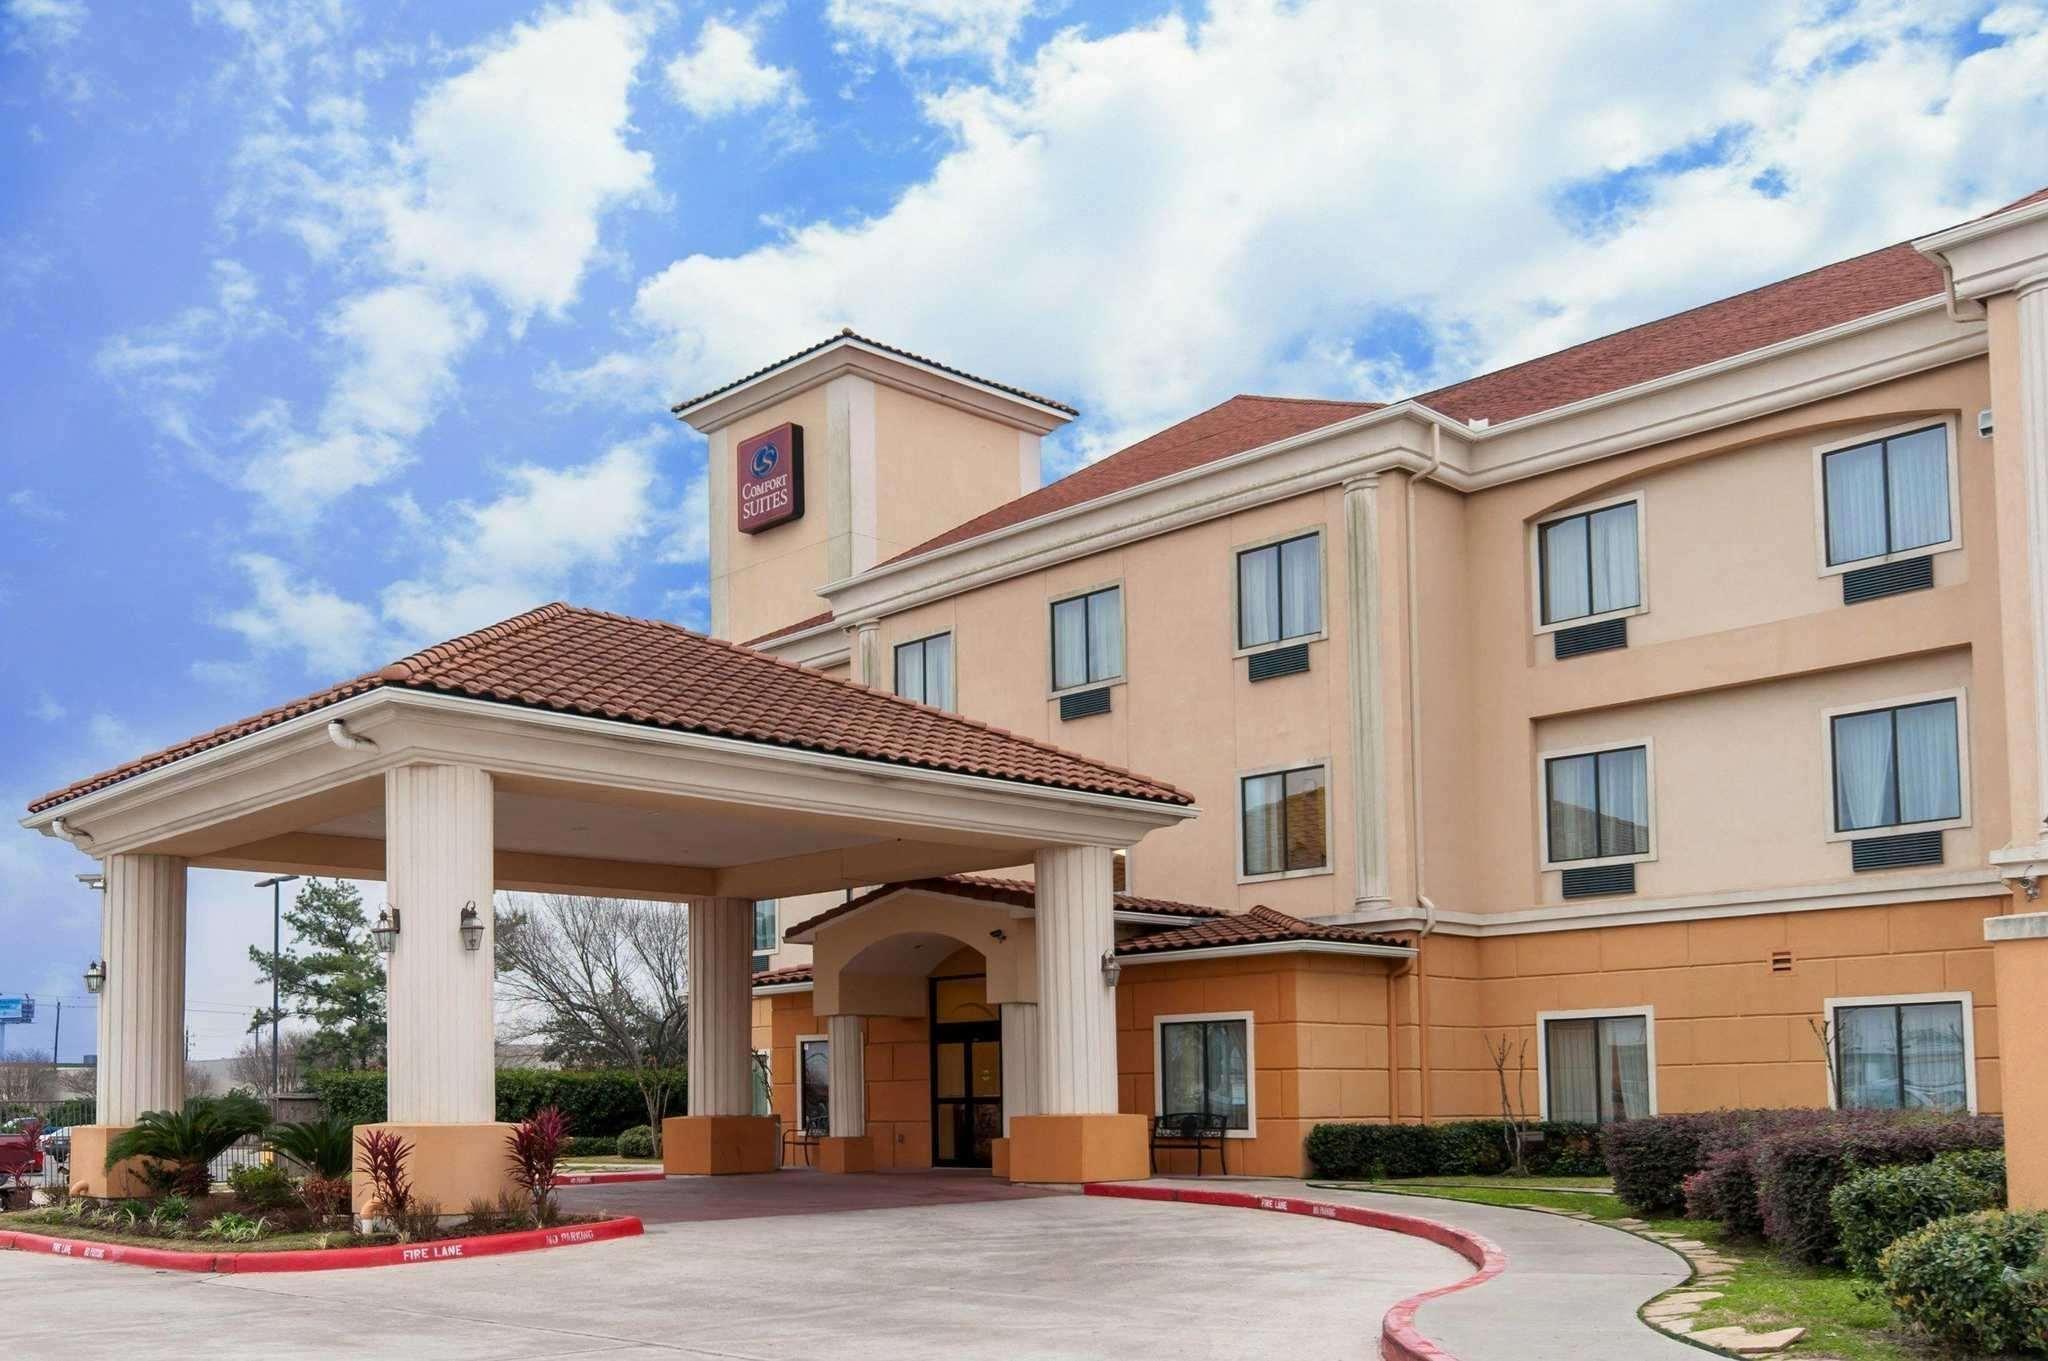 Comfort Suites Hobby Airport Hotel Houston